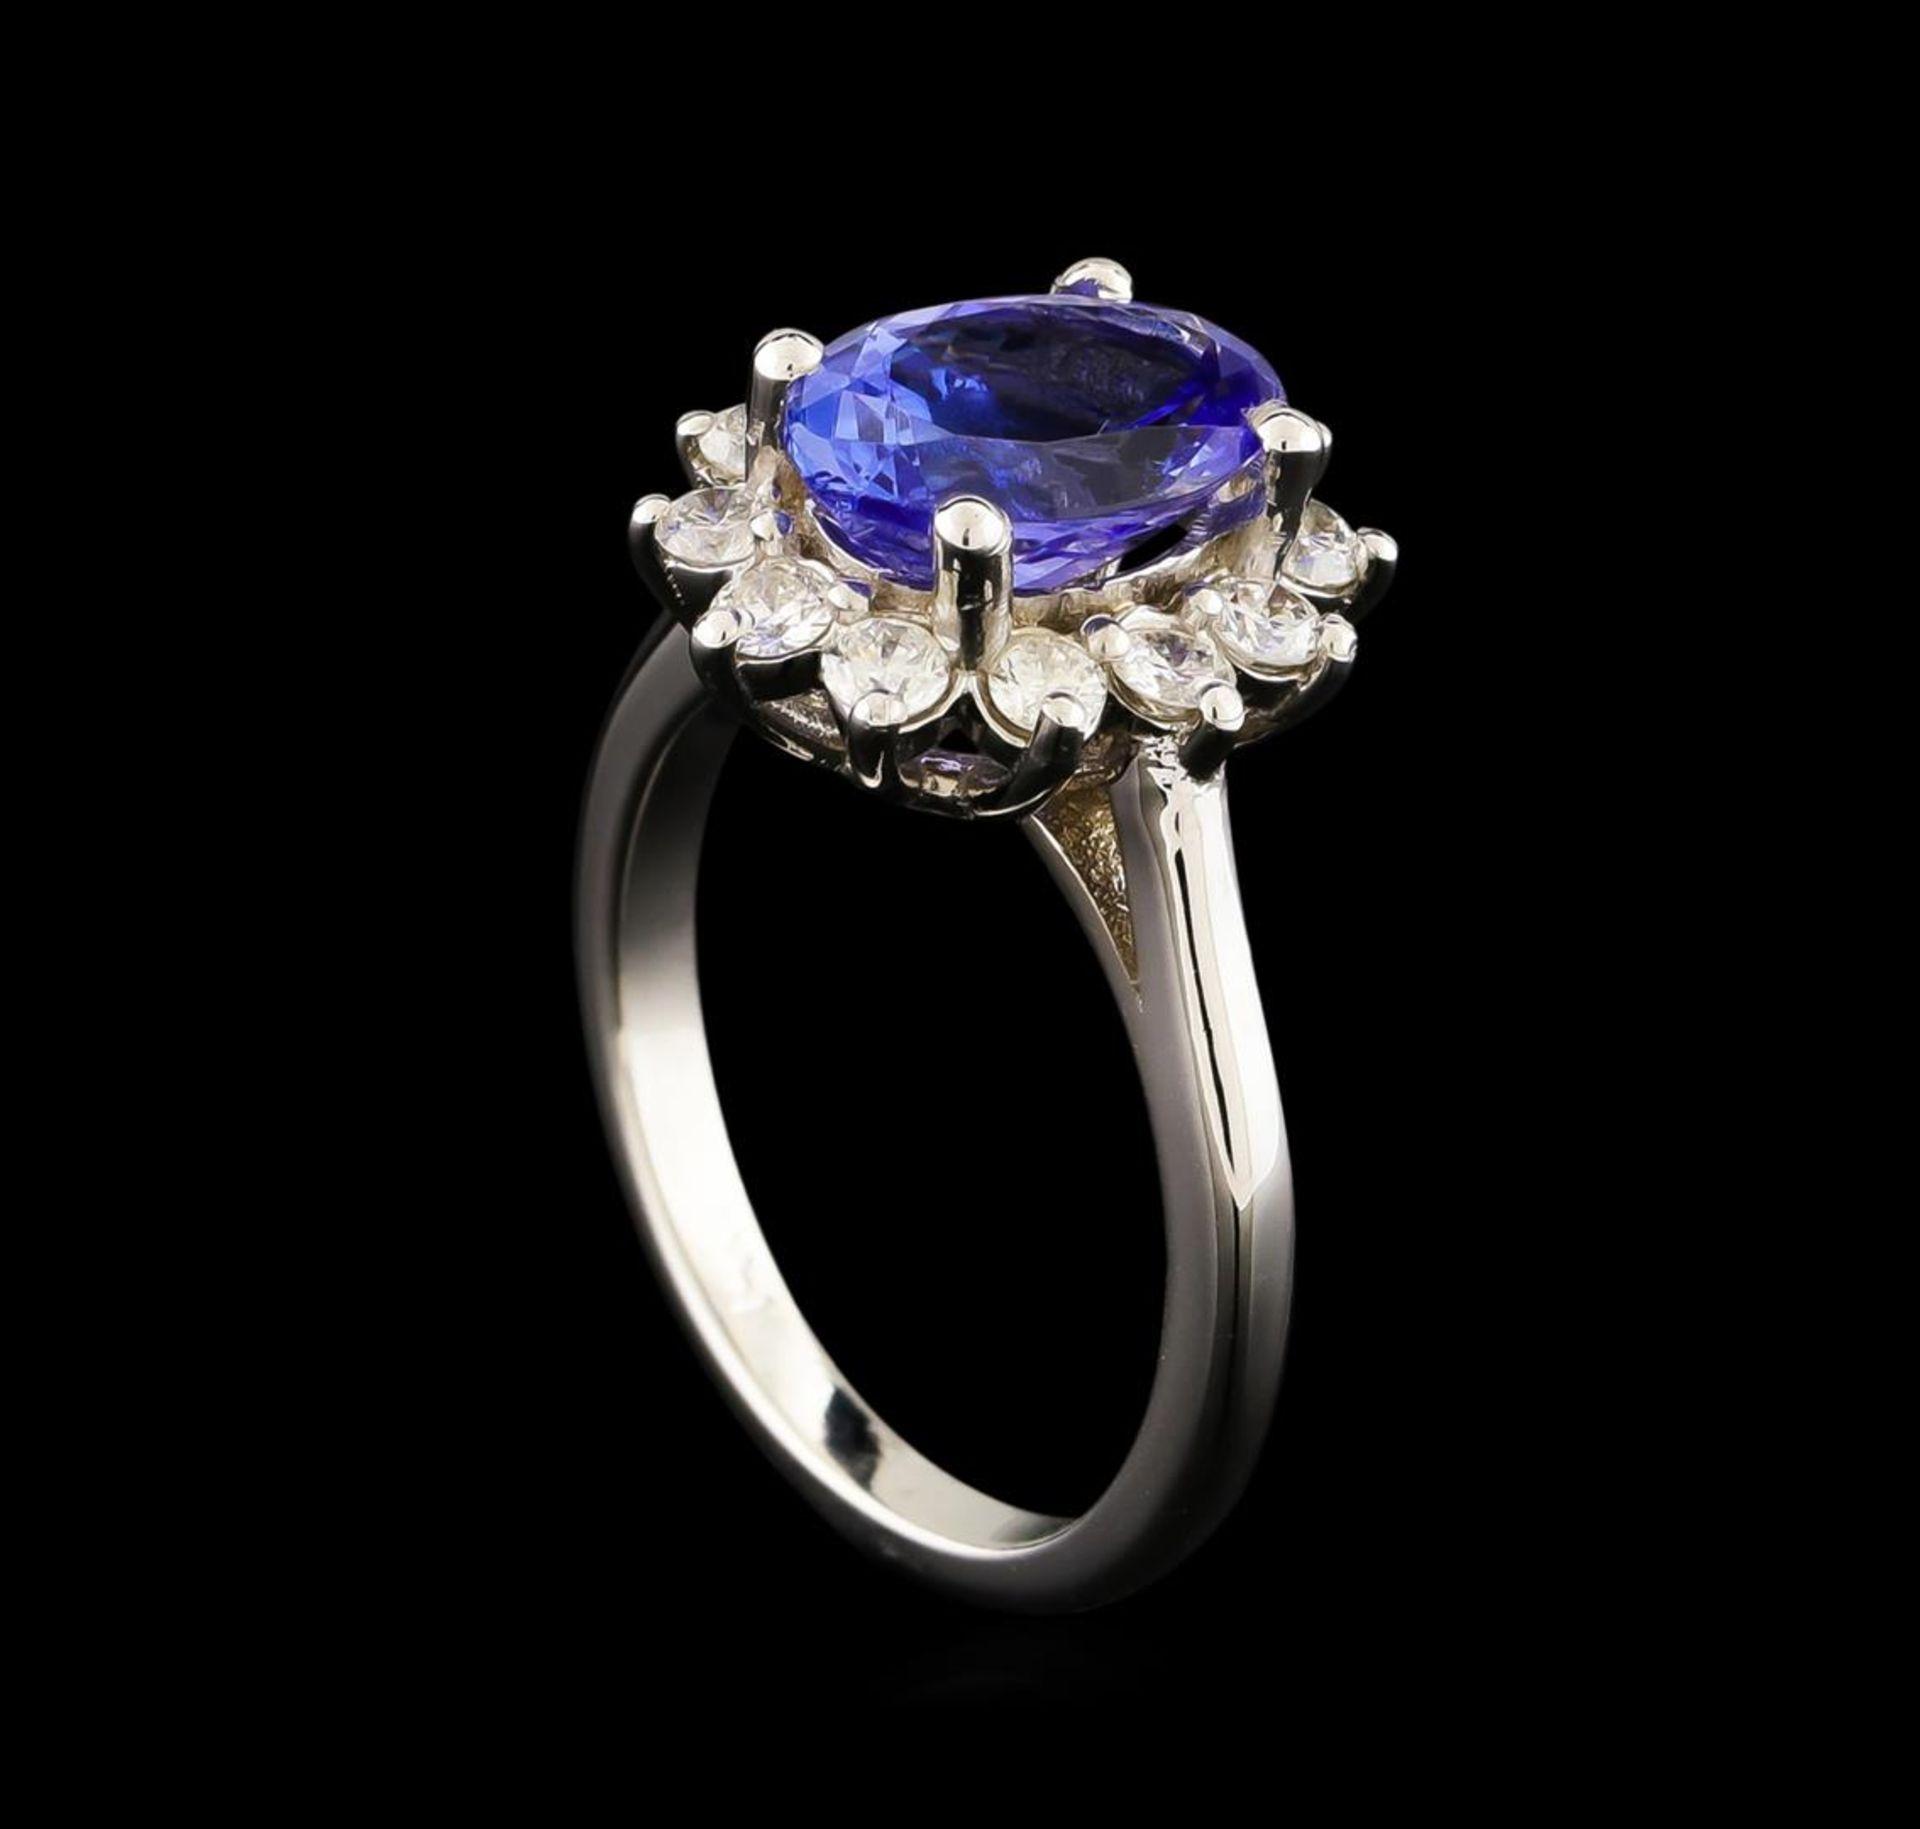 2.61 ctw Tanzanite and Diamond Ring - 14KT White Gold - Image 4 of 5